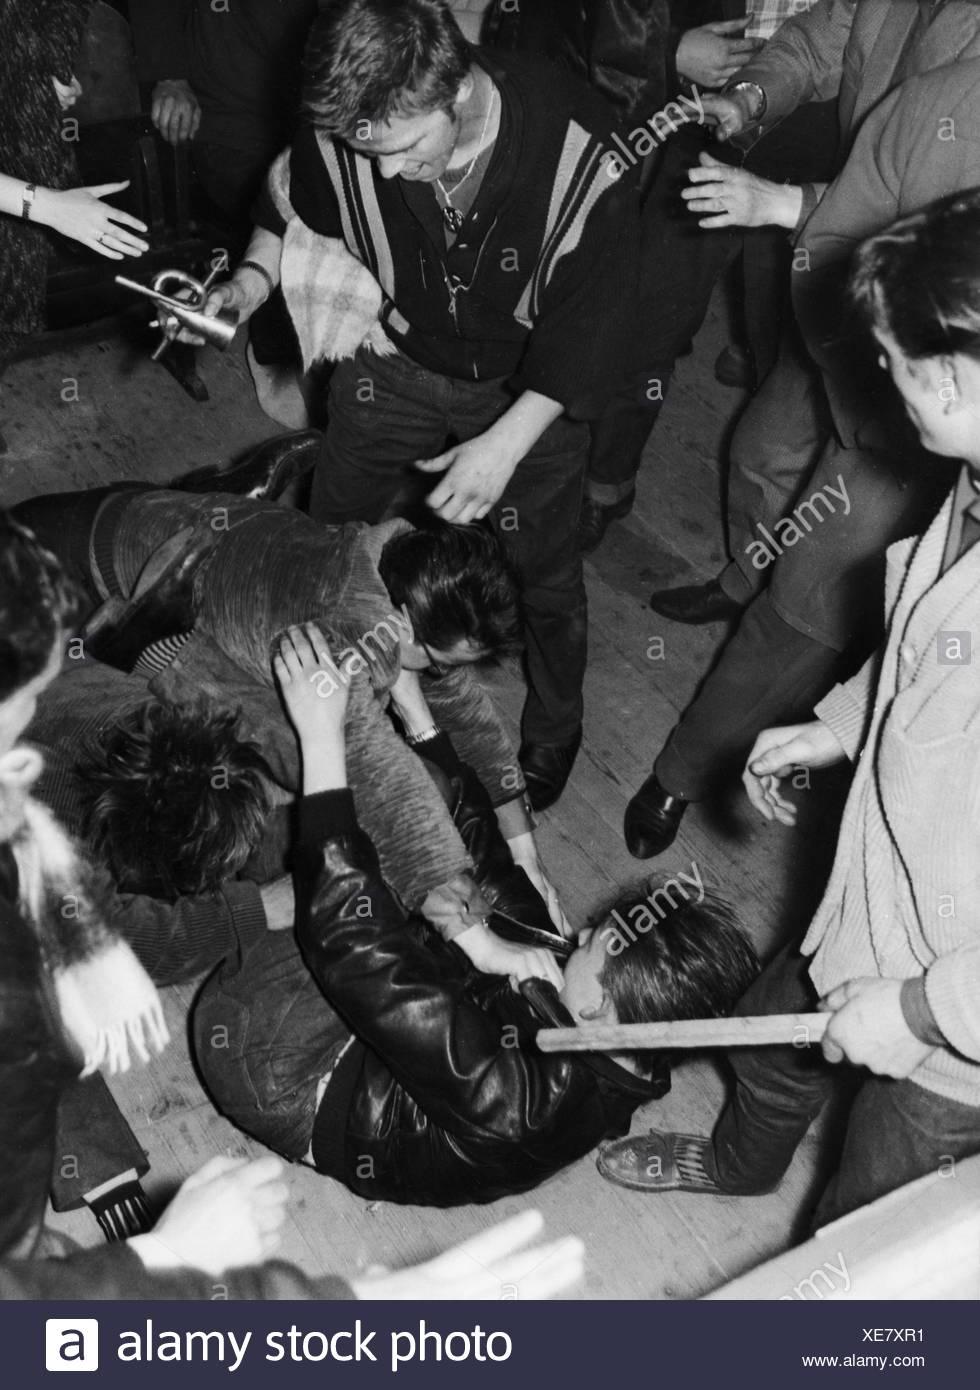 Haley, Bill, 6.7.1935 - 9.2.1981, American musician (Rock'n Roll), rioting fan people during concert, Berlin, Germany, 26.10.195 Stockbild